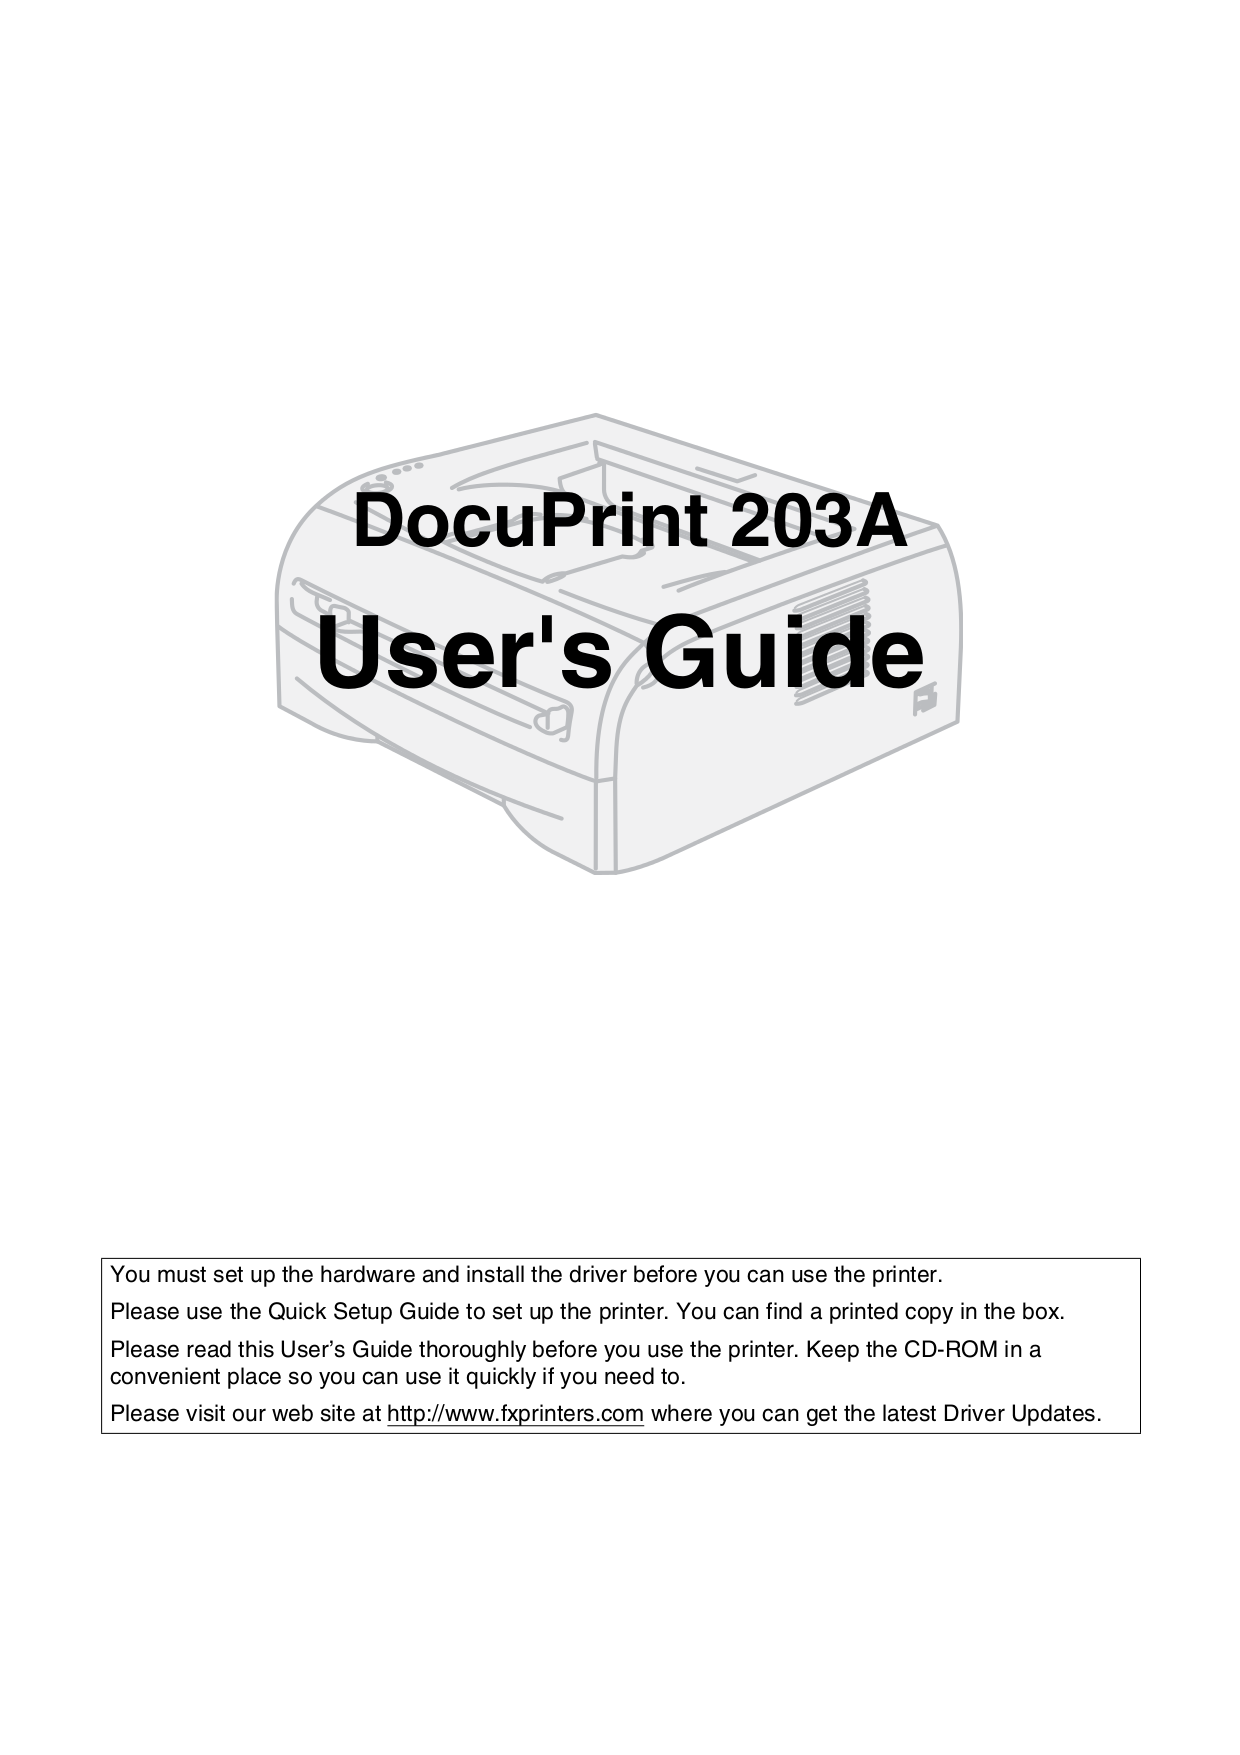 pdf for Xerox Printer DocuPrint C11 manual